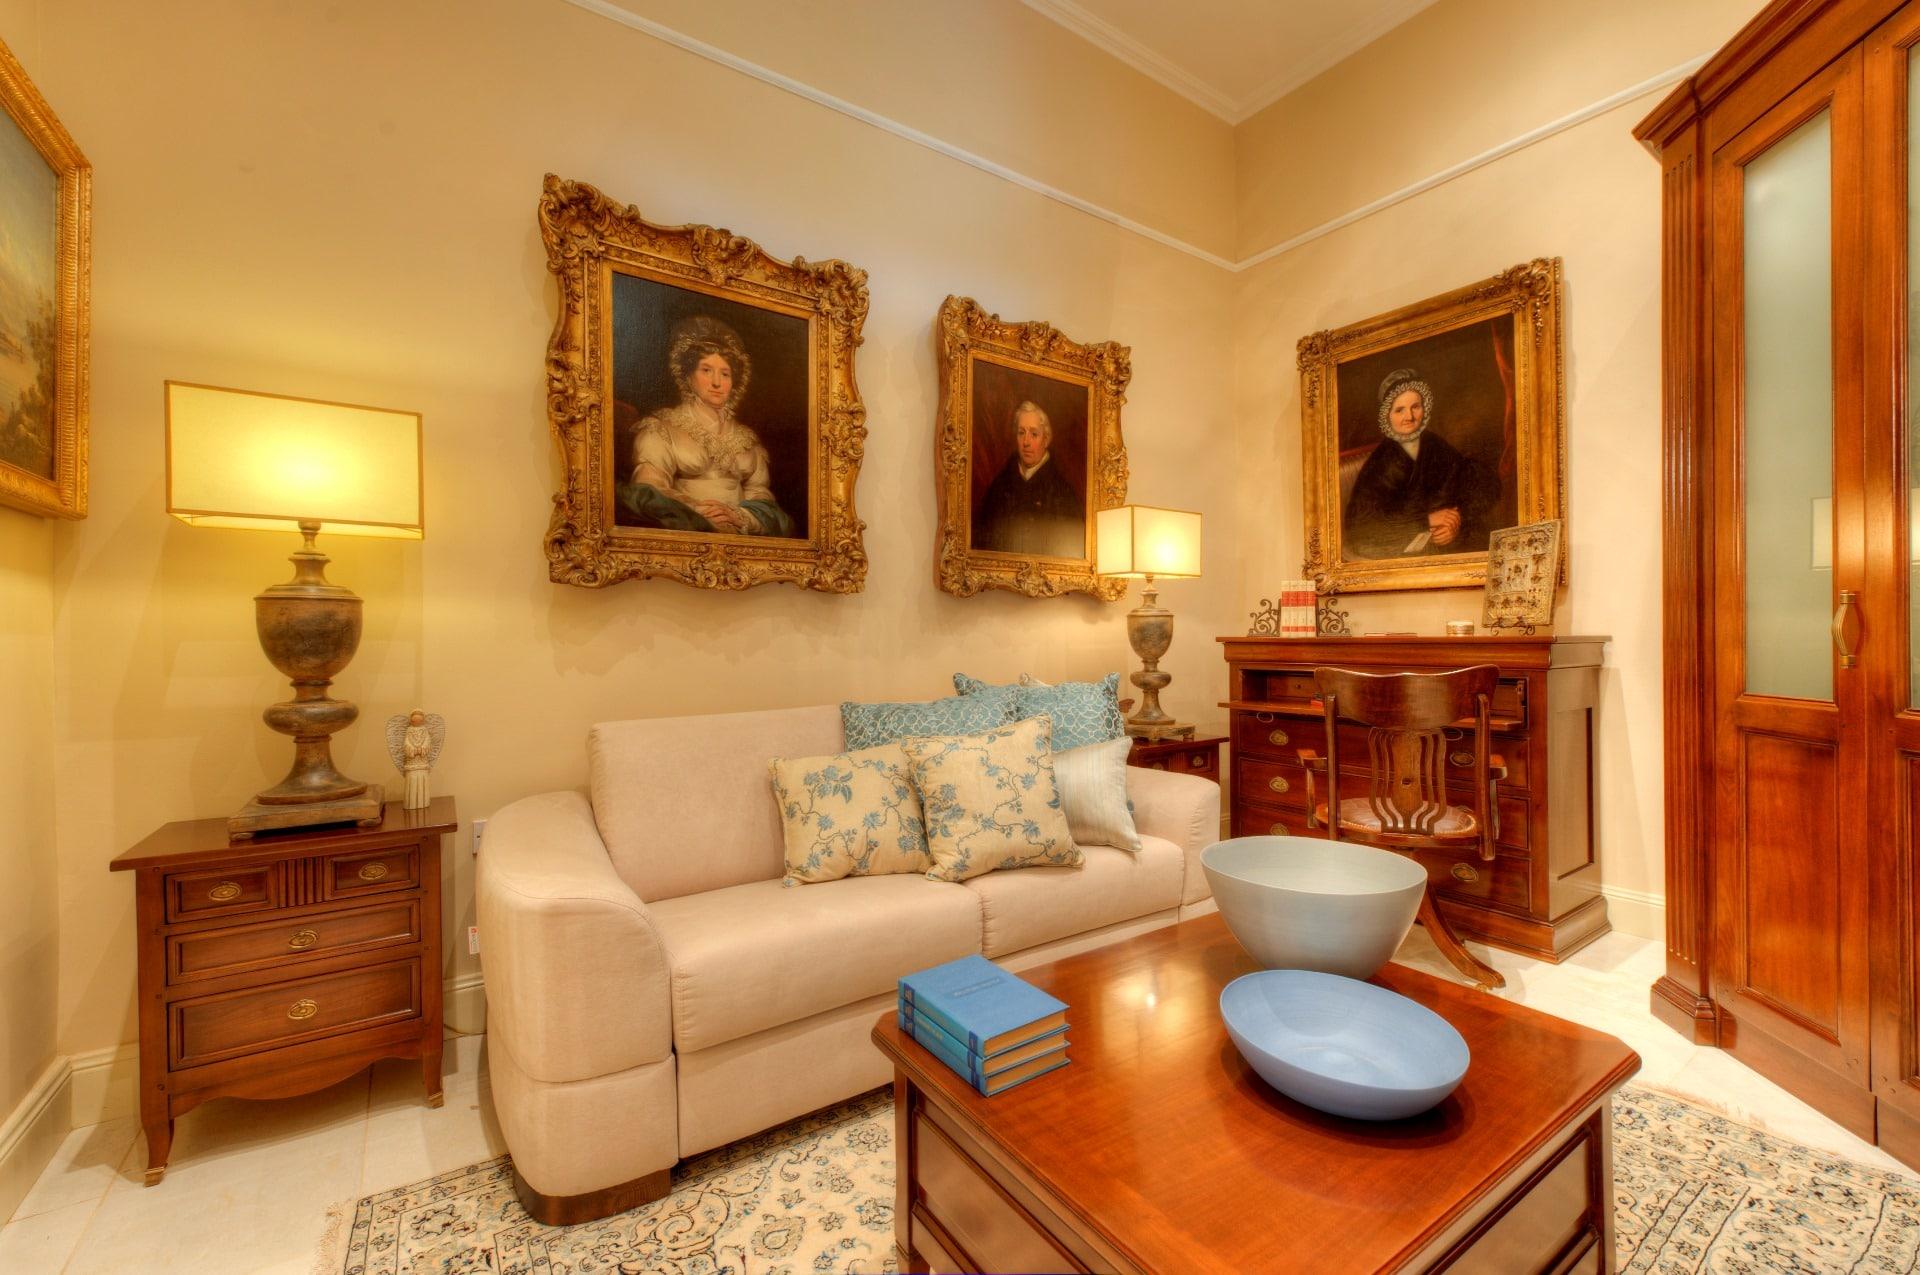 Linen Room – paintings, sofa, storage, carpet, lamps